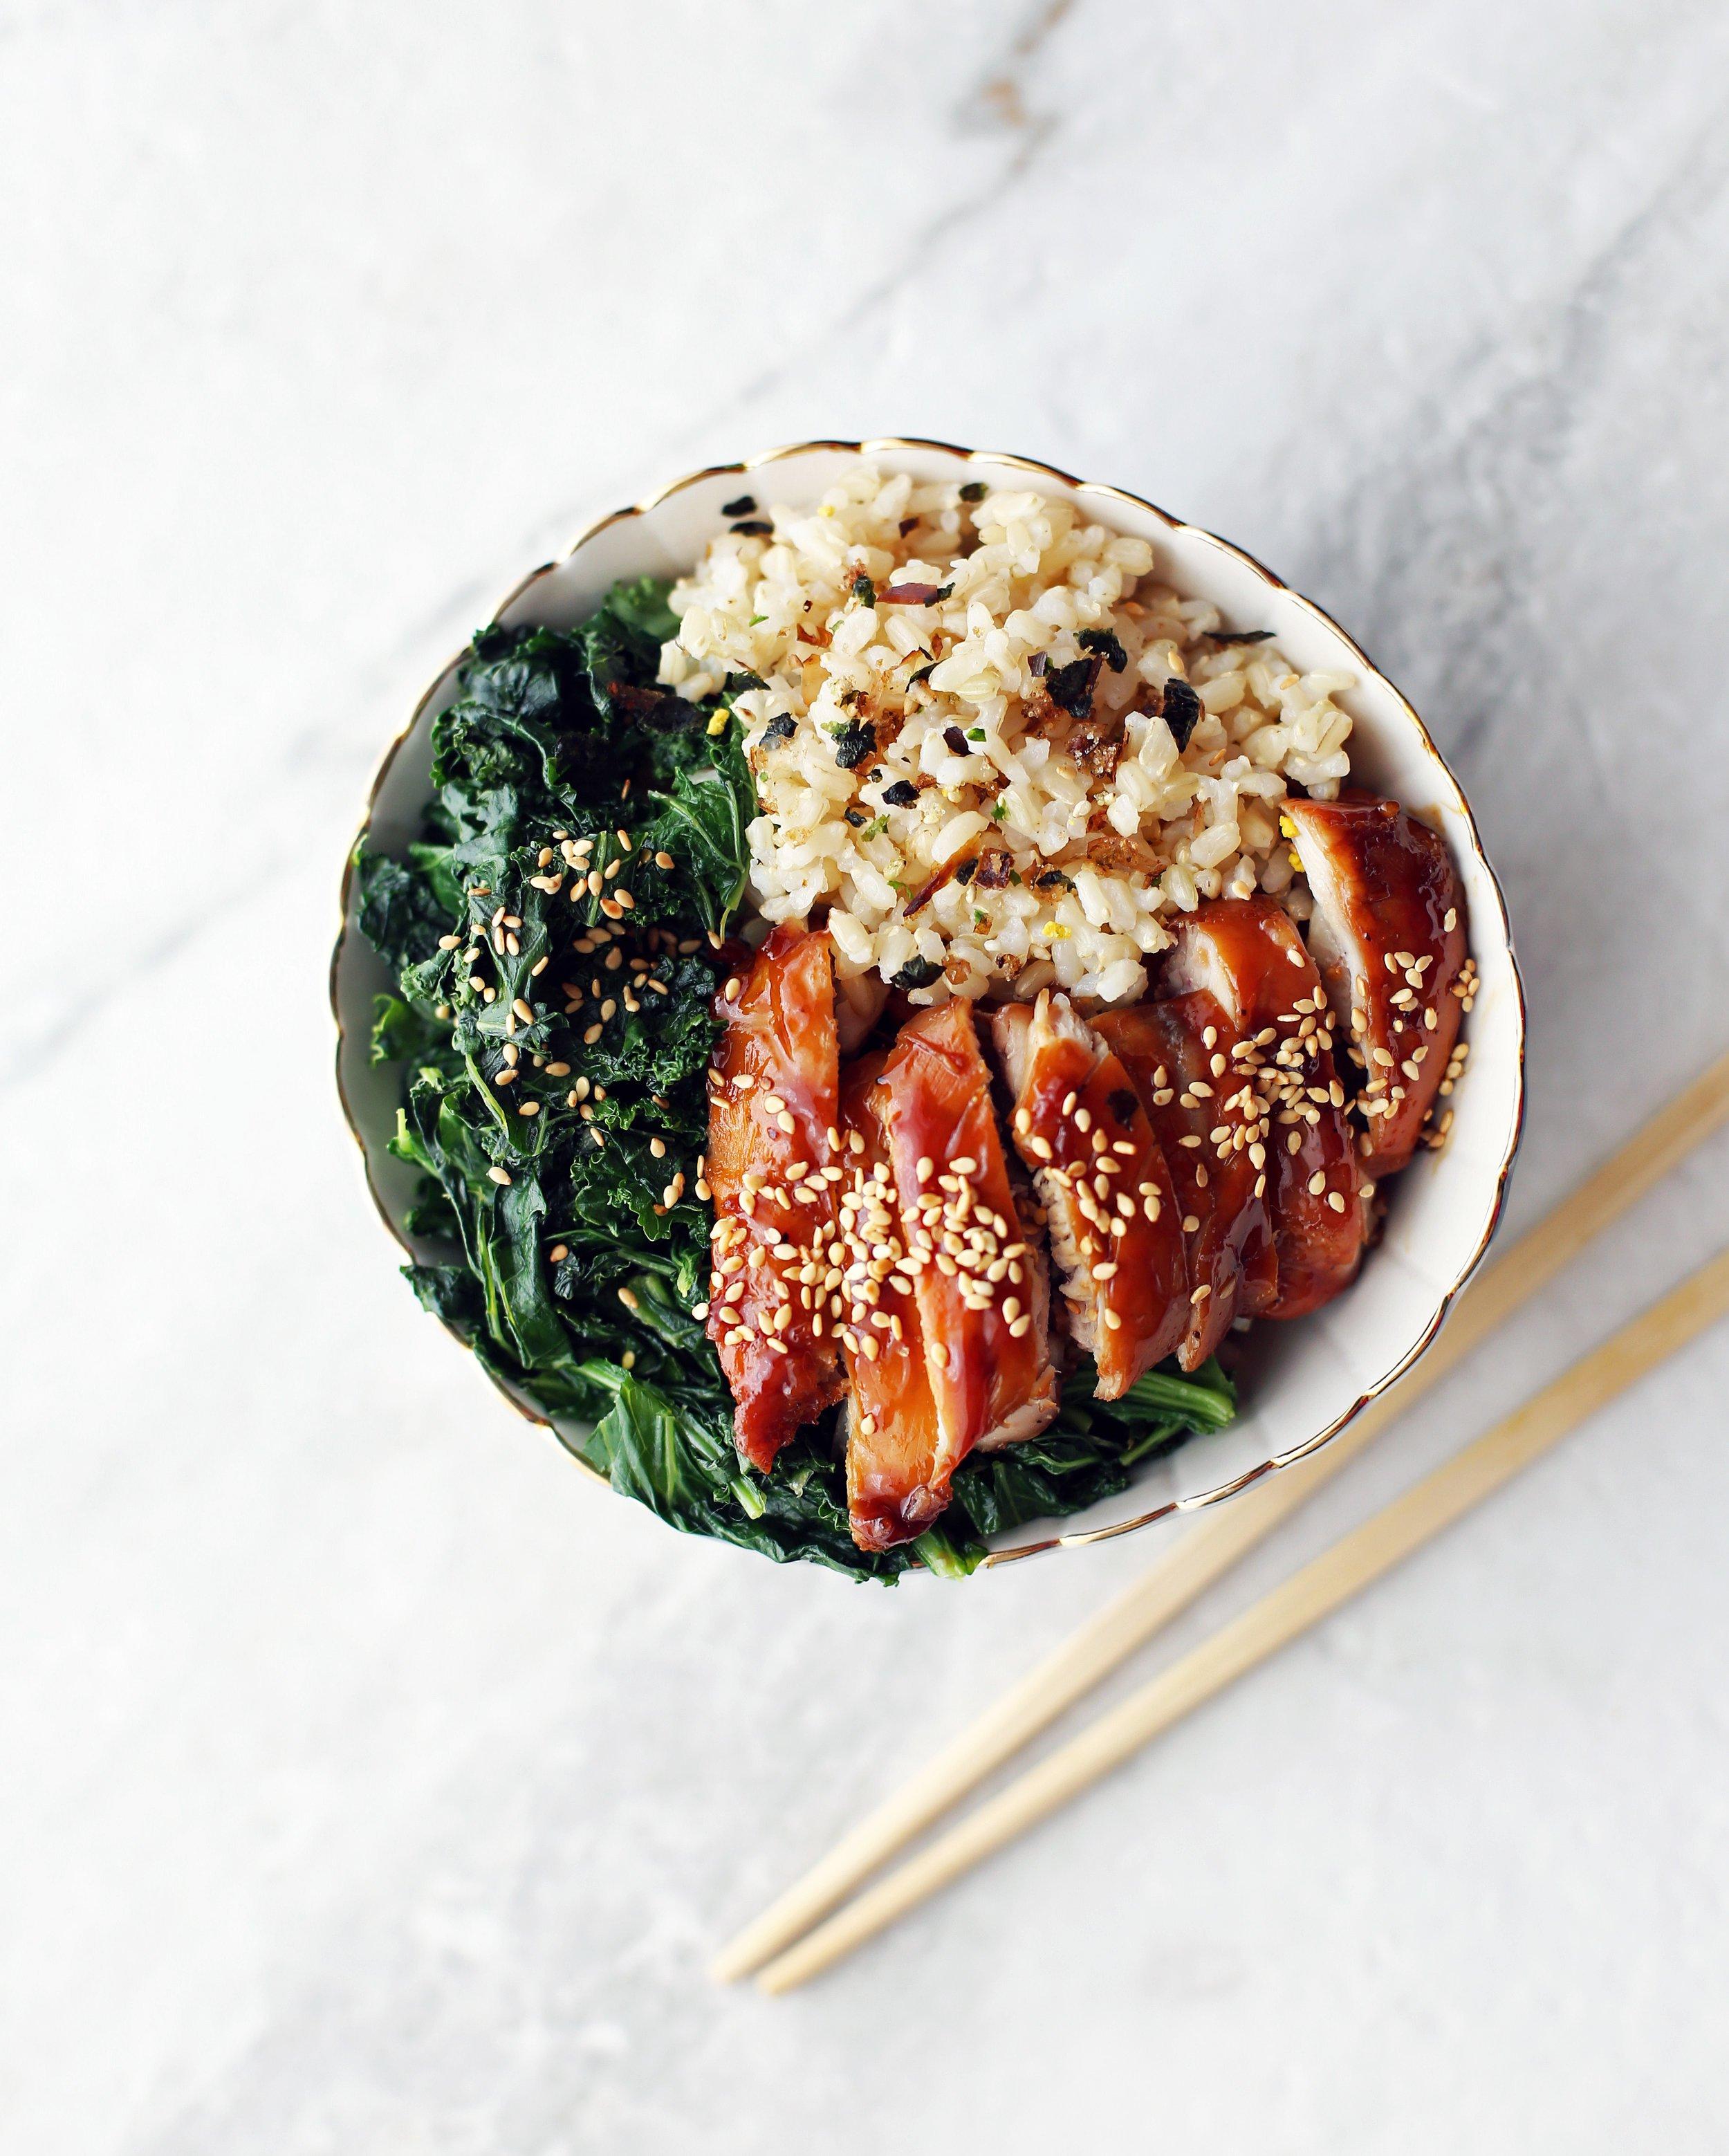 Teriyaki Chicken Rice Bowls with Garlicky Kale